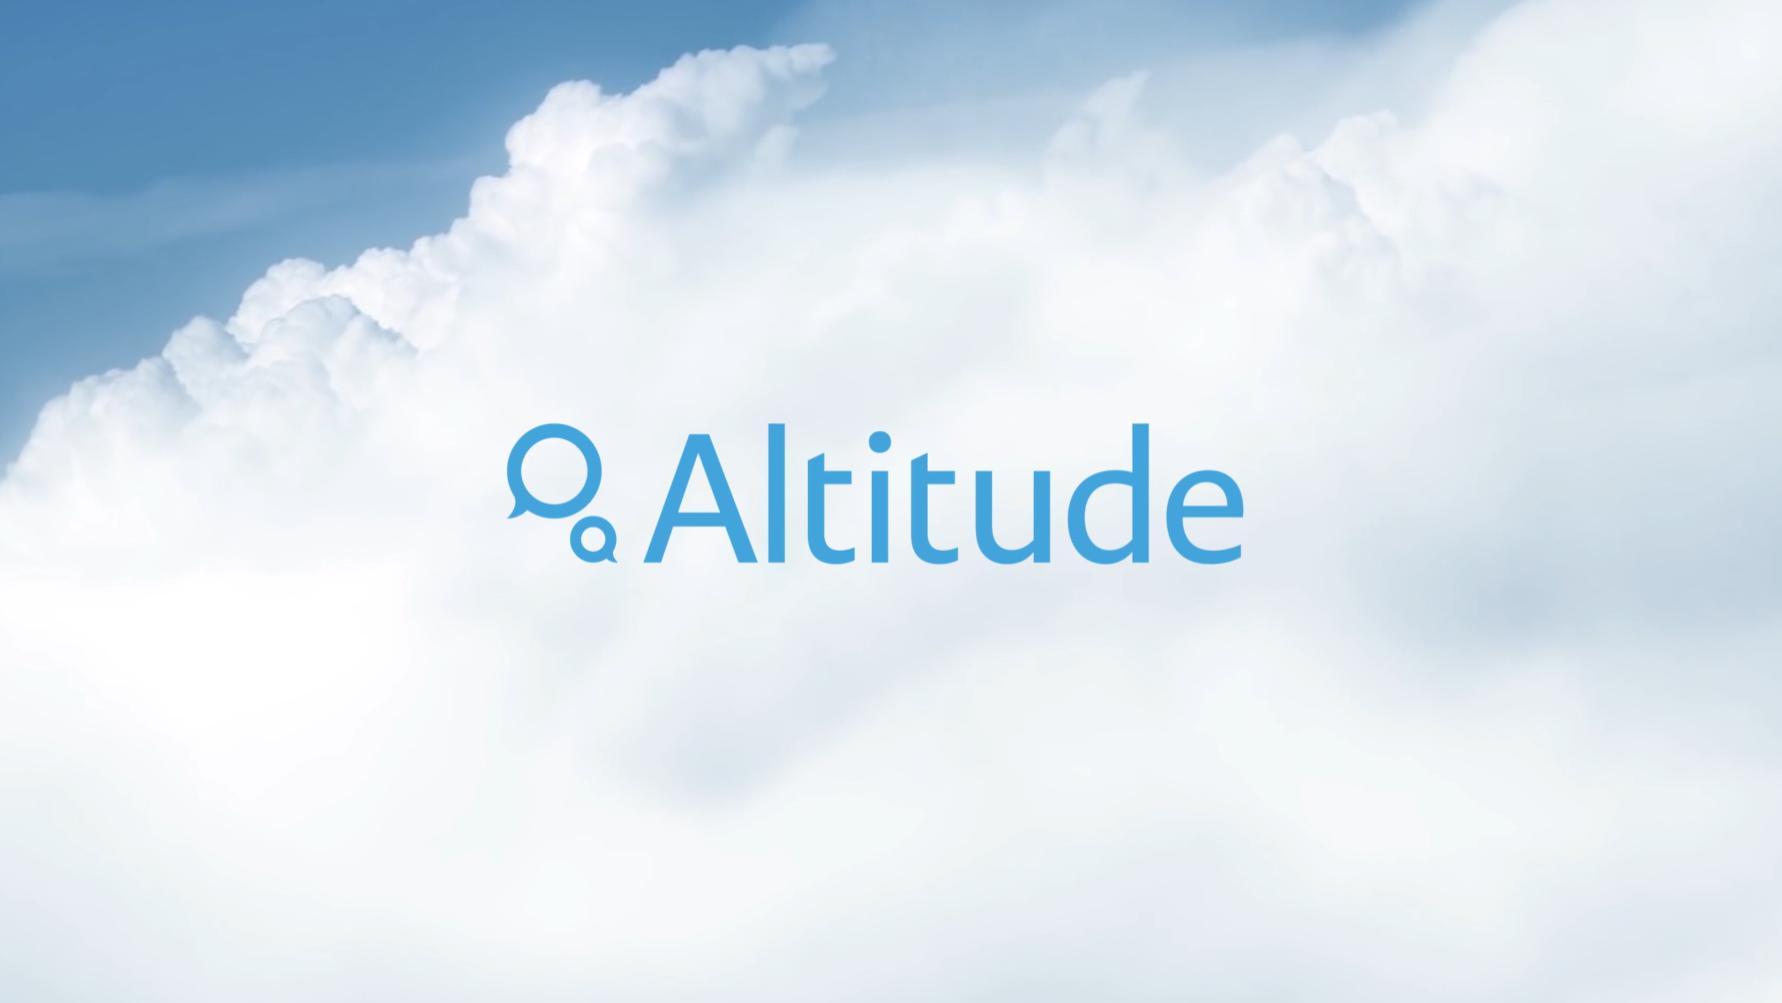 Altitude video